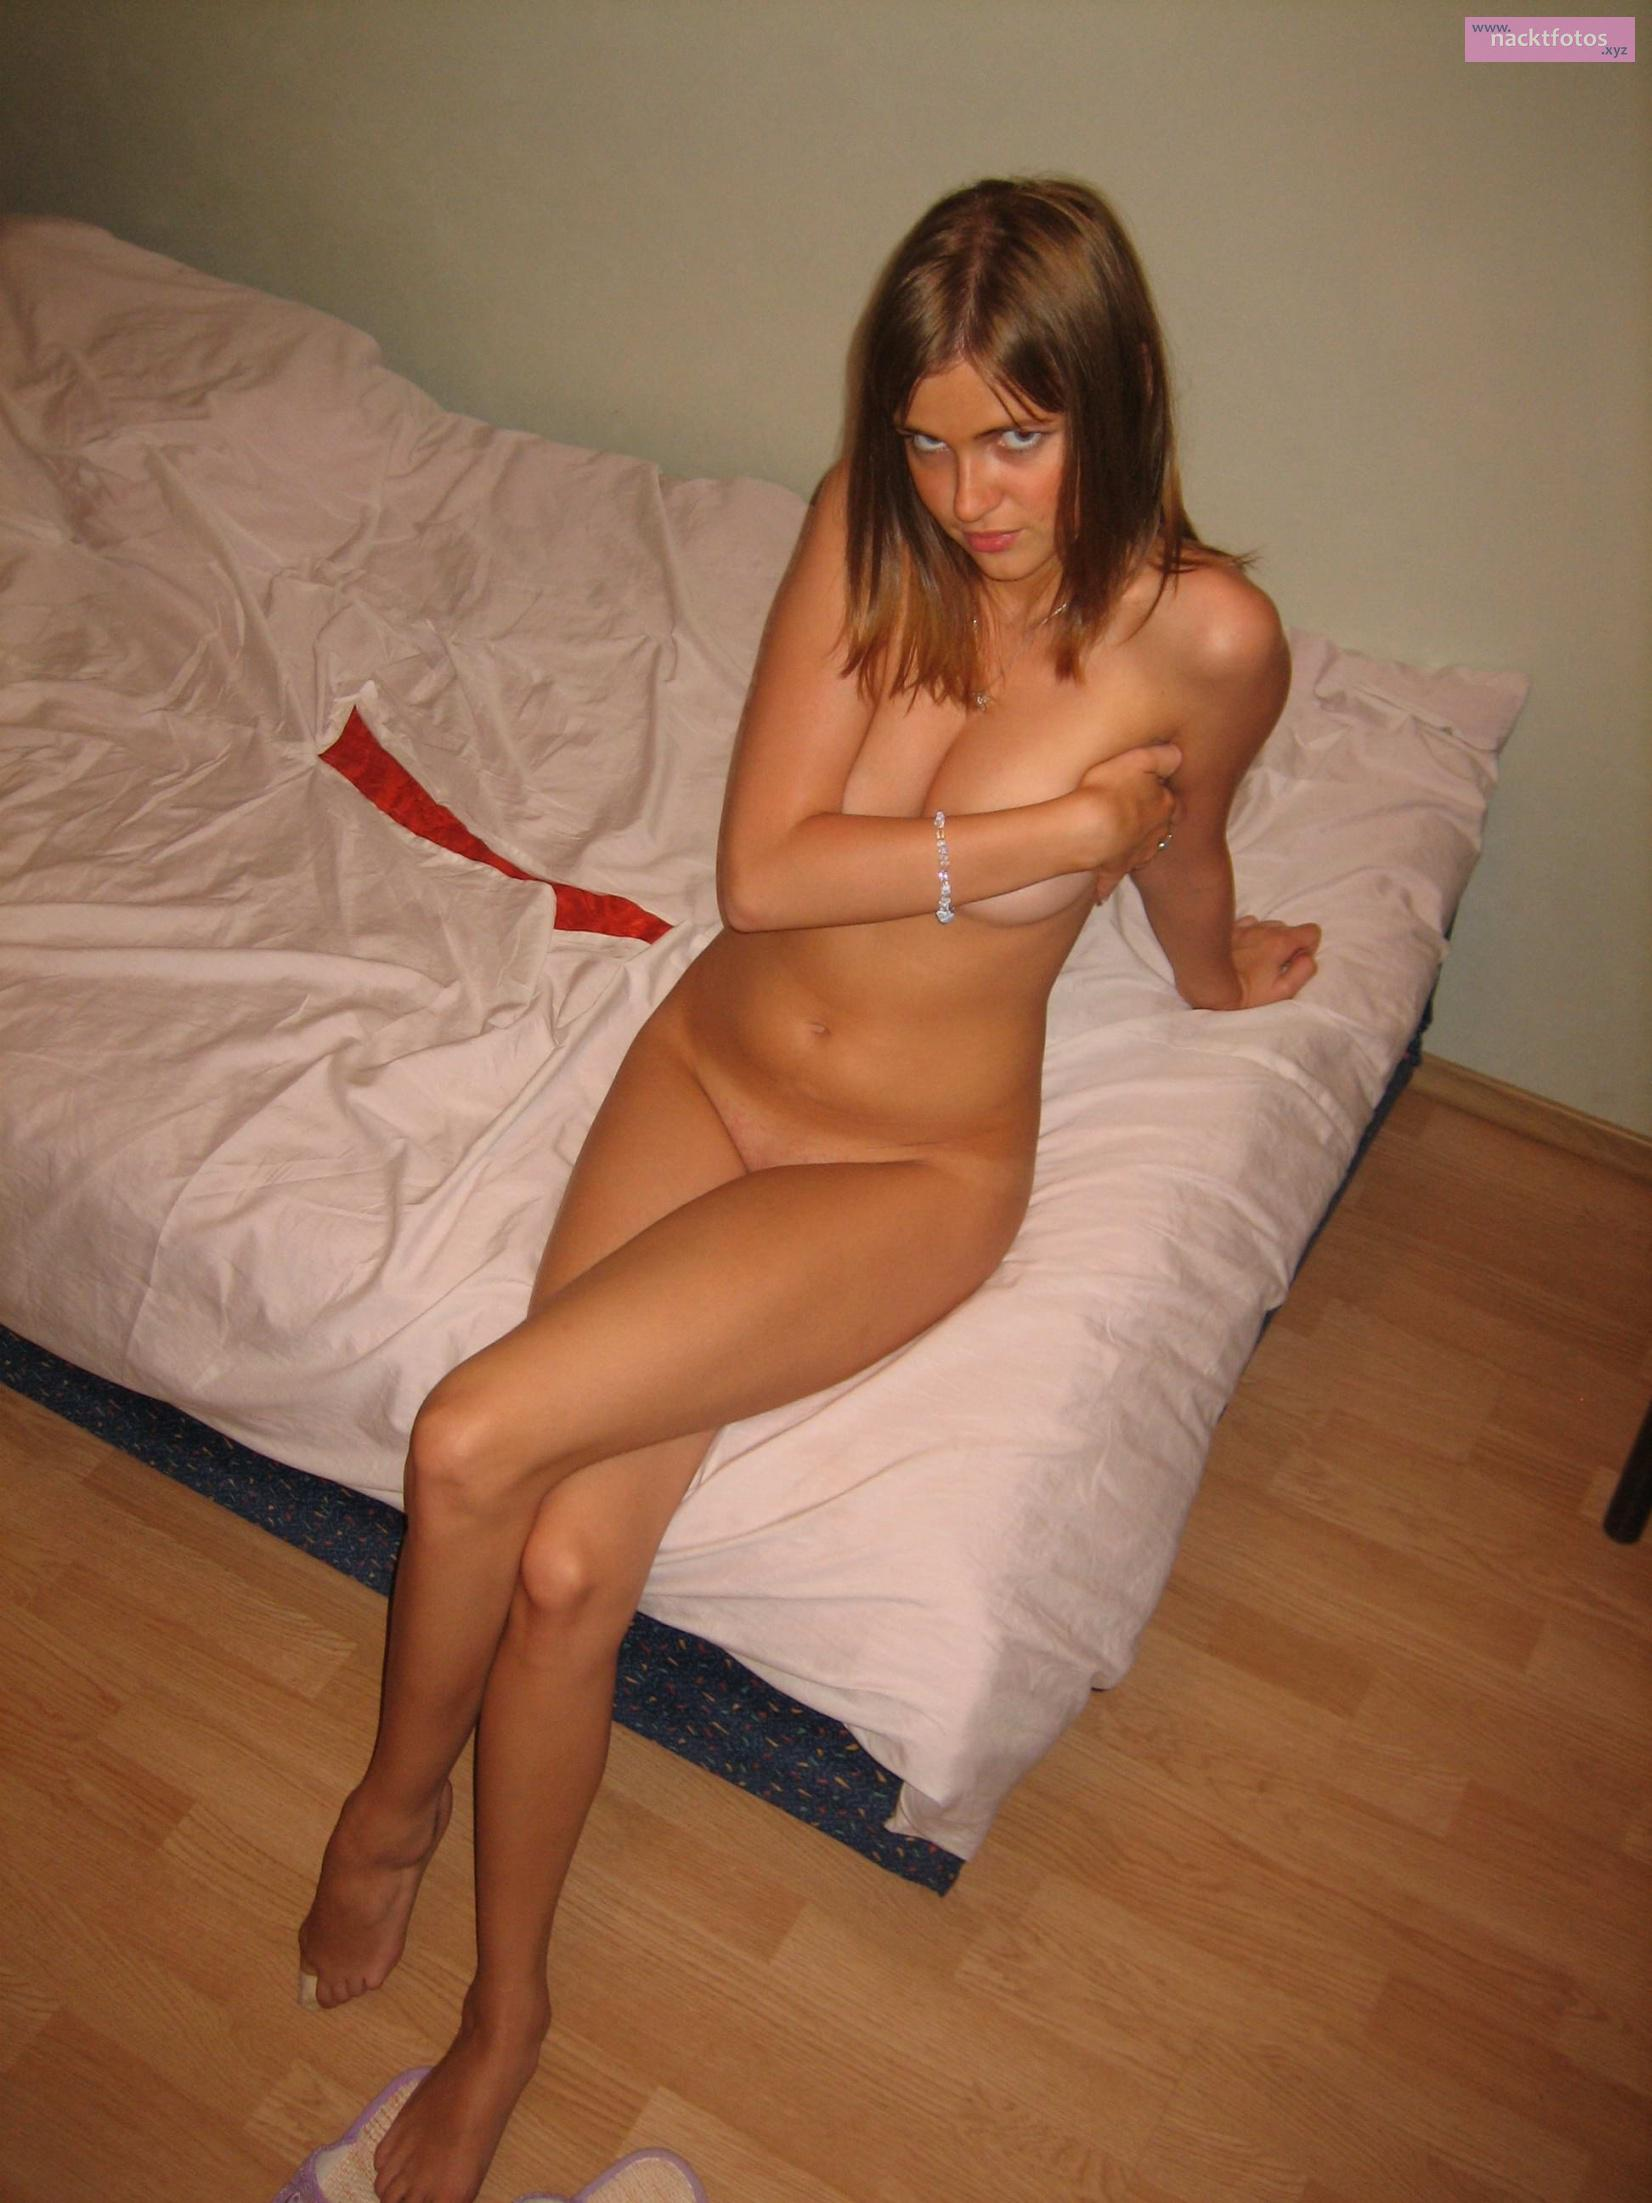 Süße Teen Nackt